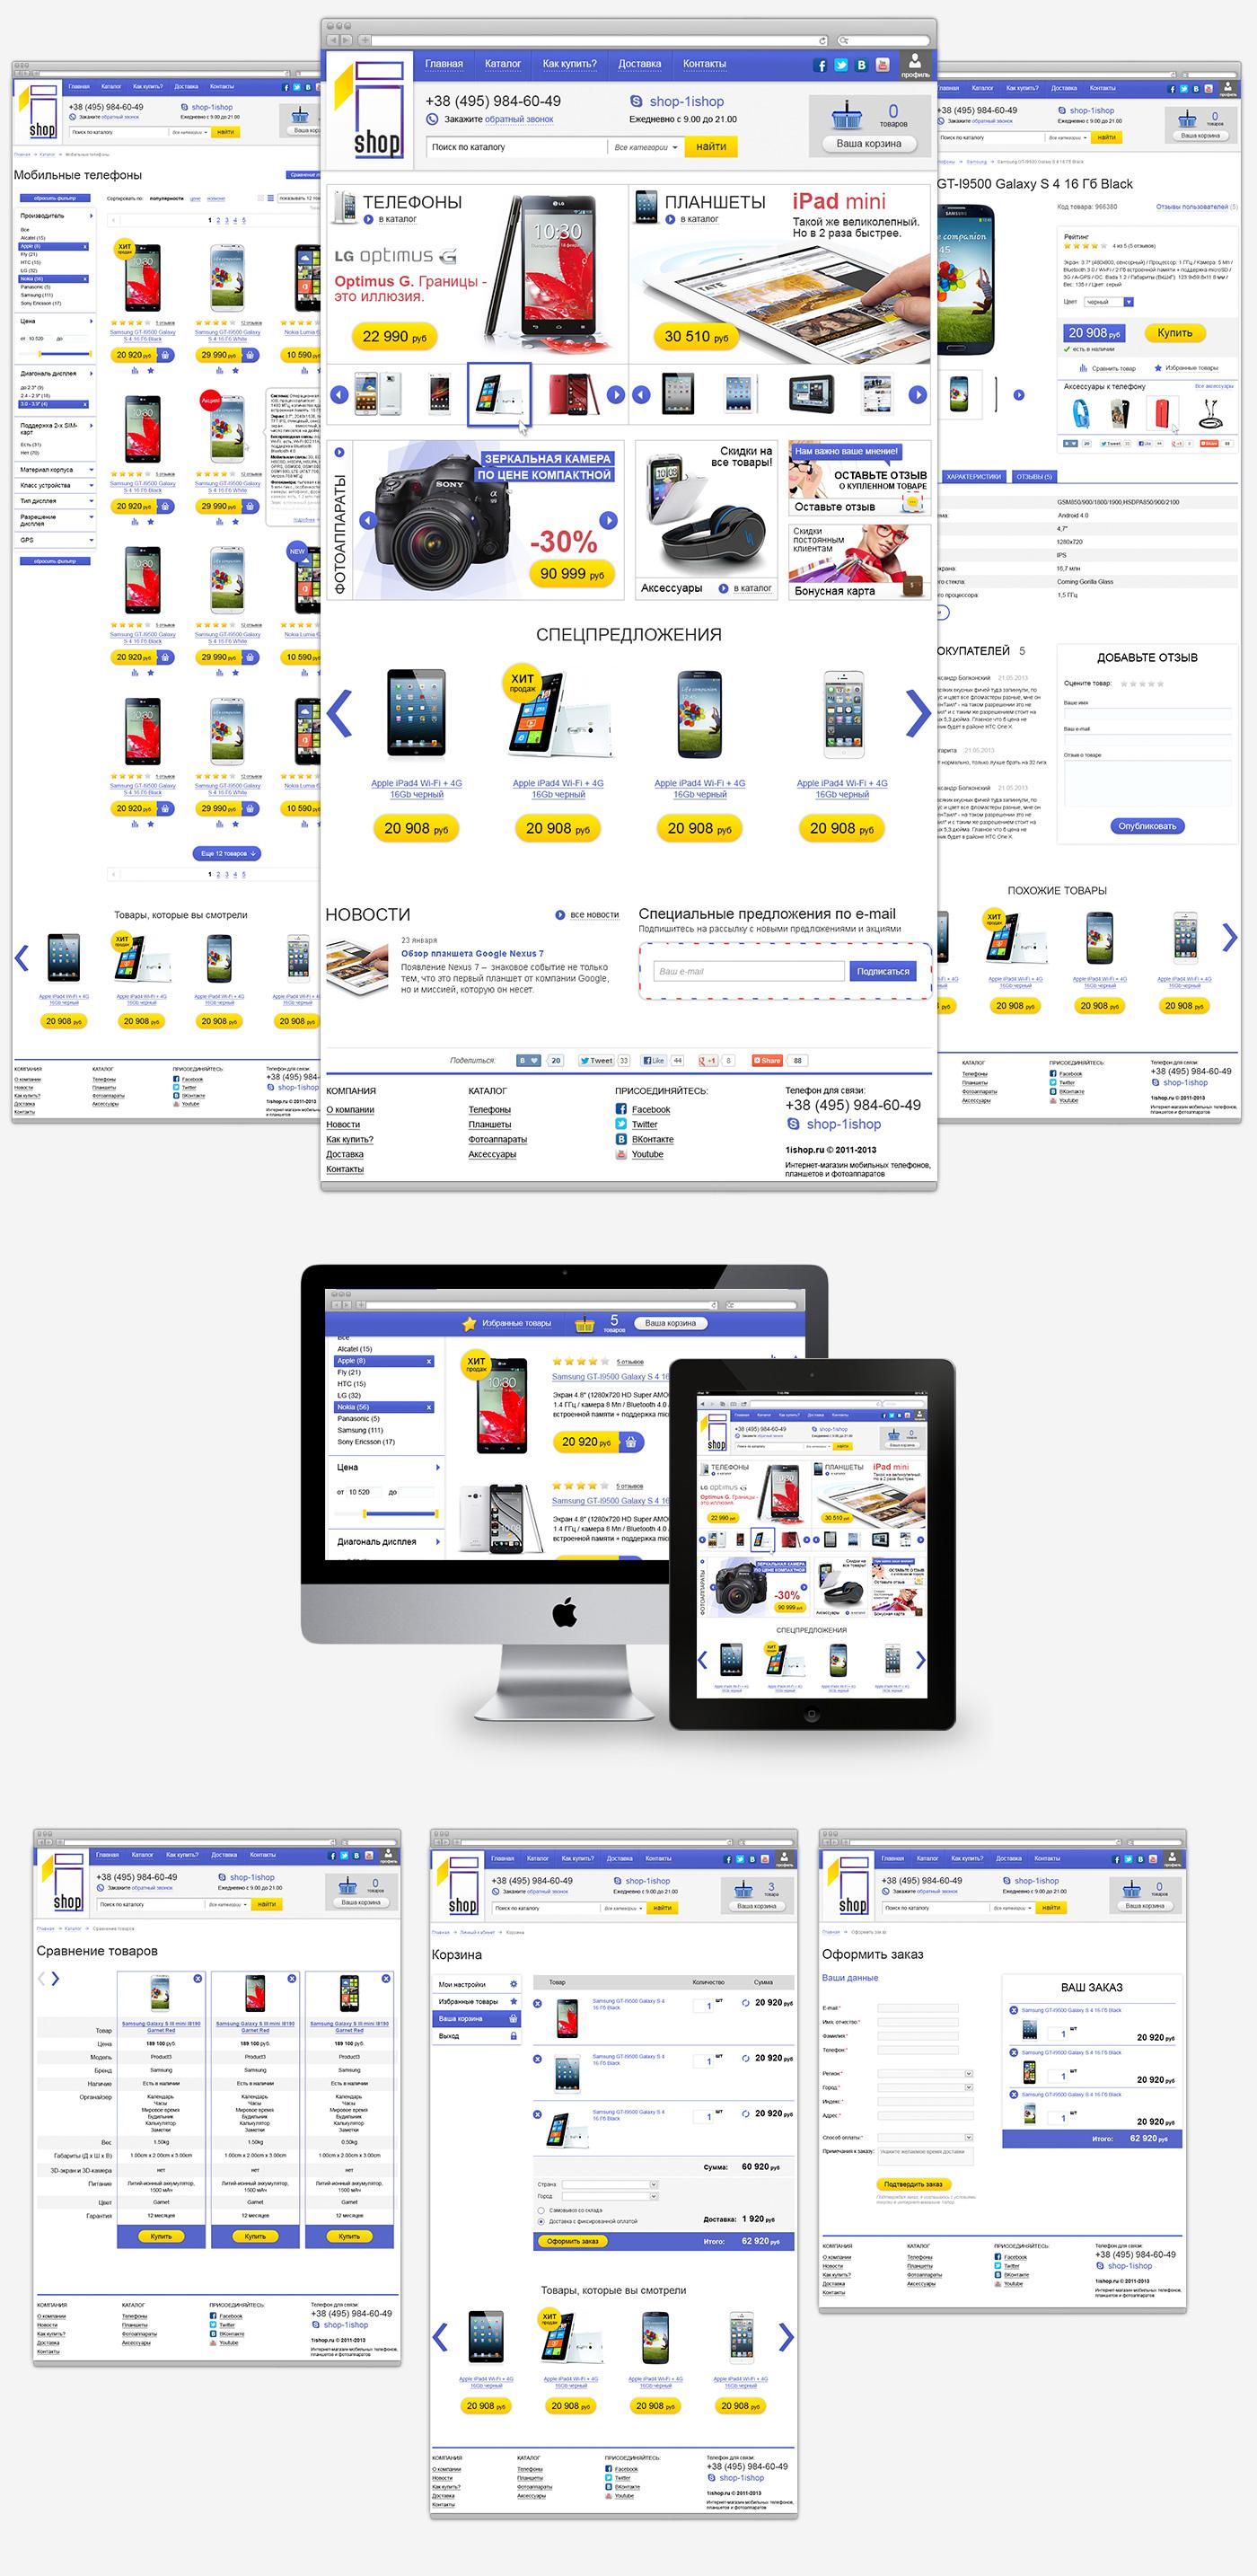 Дизайн интернет-магазина цифровой техники